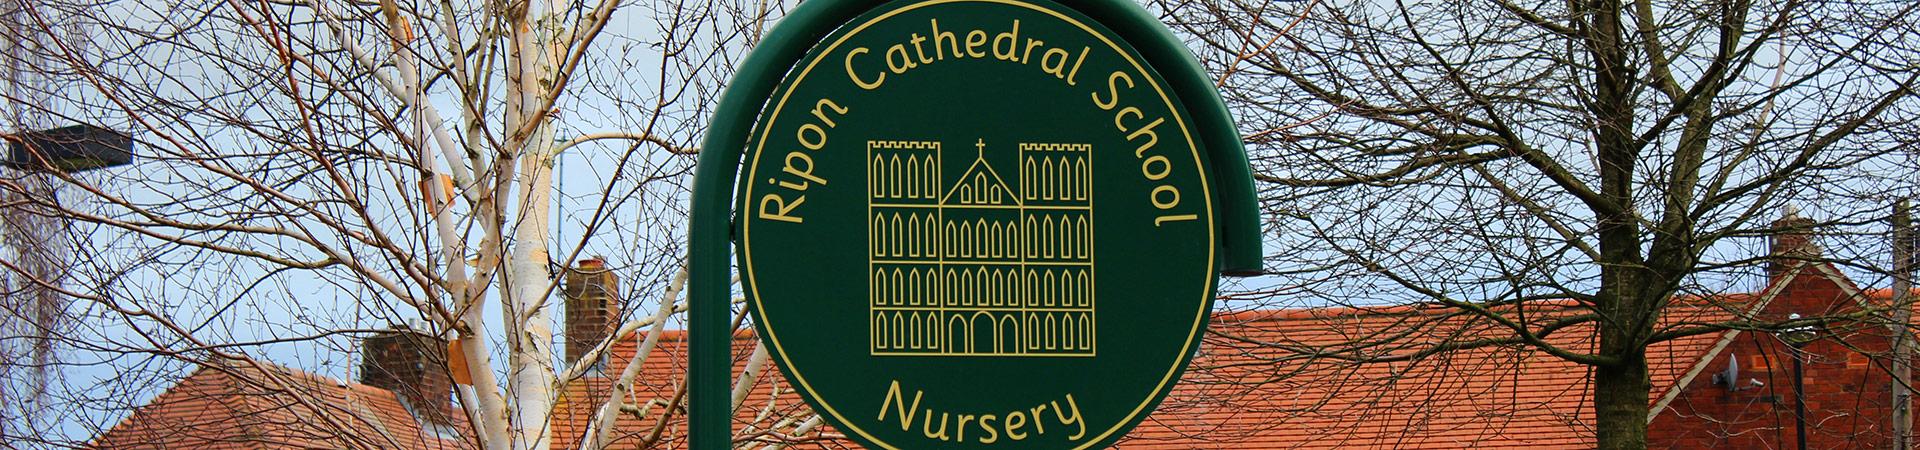 Ripon Cathedral School